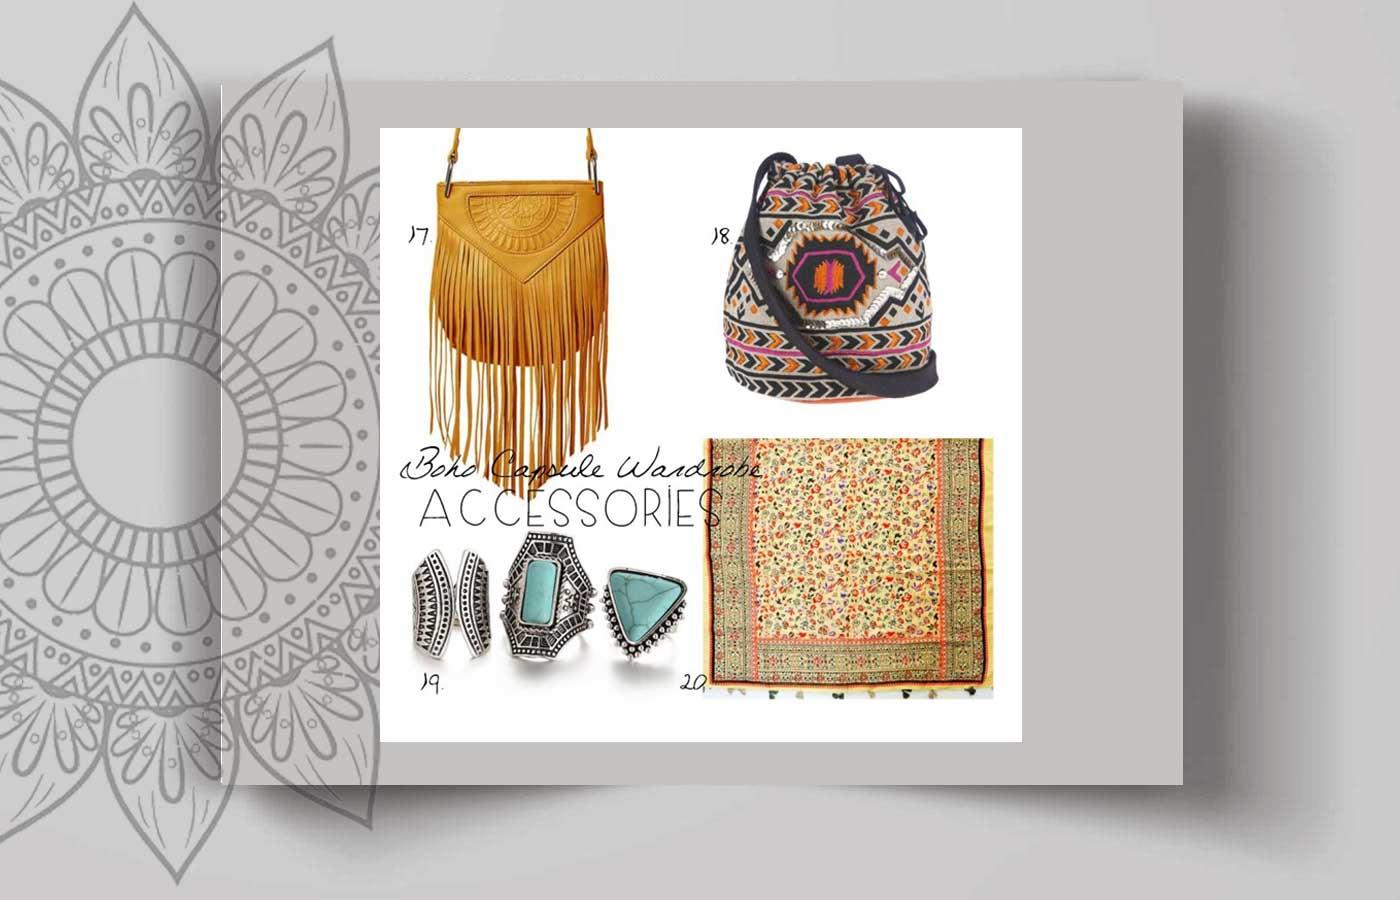 bohemian women style 44 - استایل بوهو زنانه